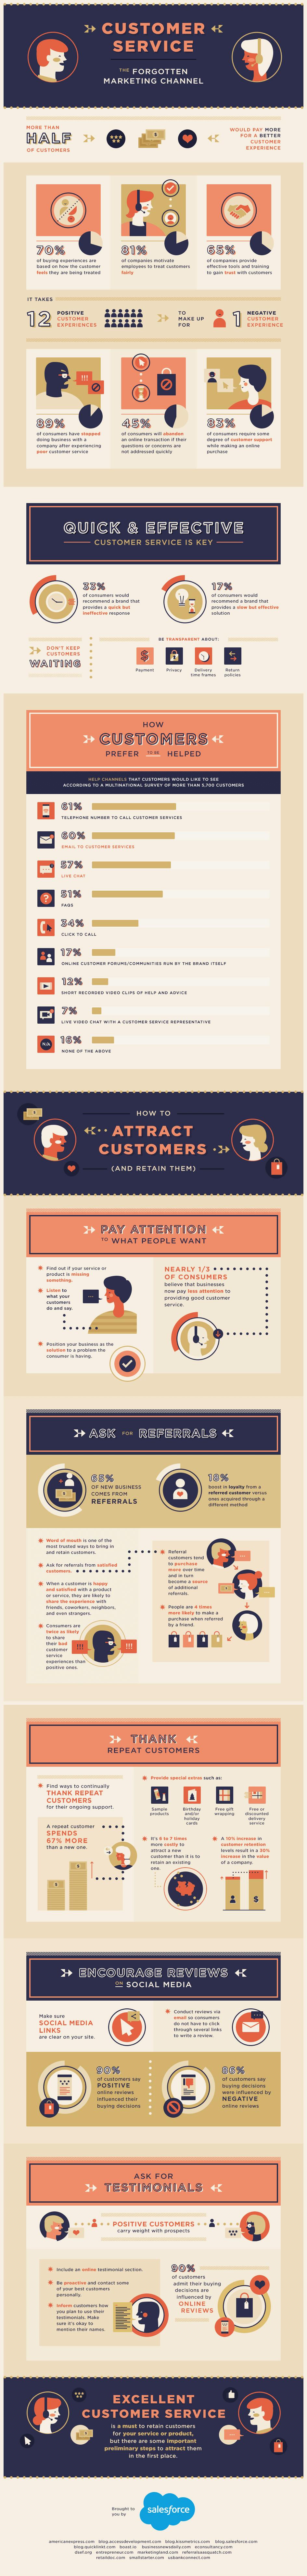 Customer Service: The Forgotten Marketing Channel